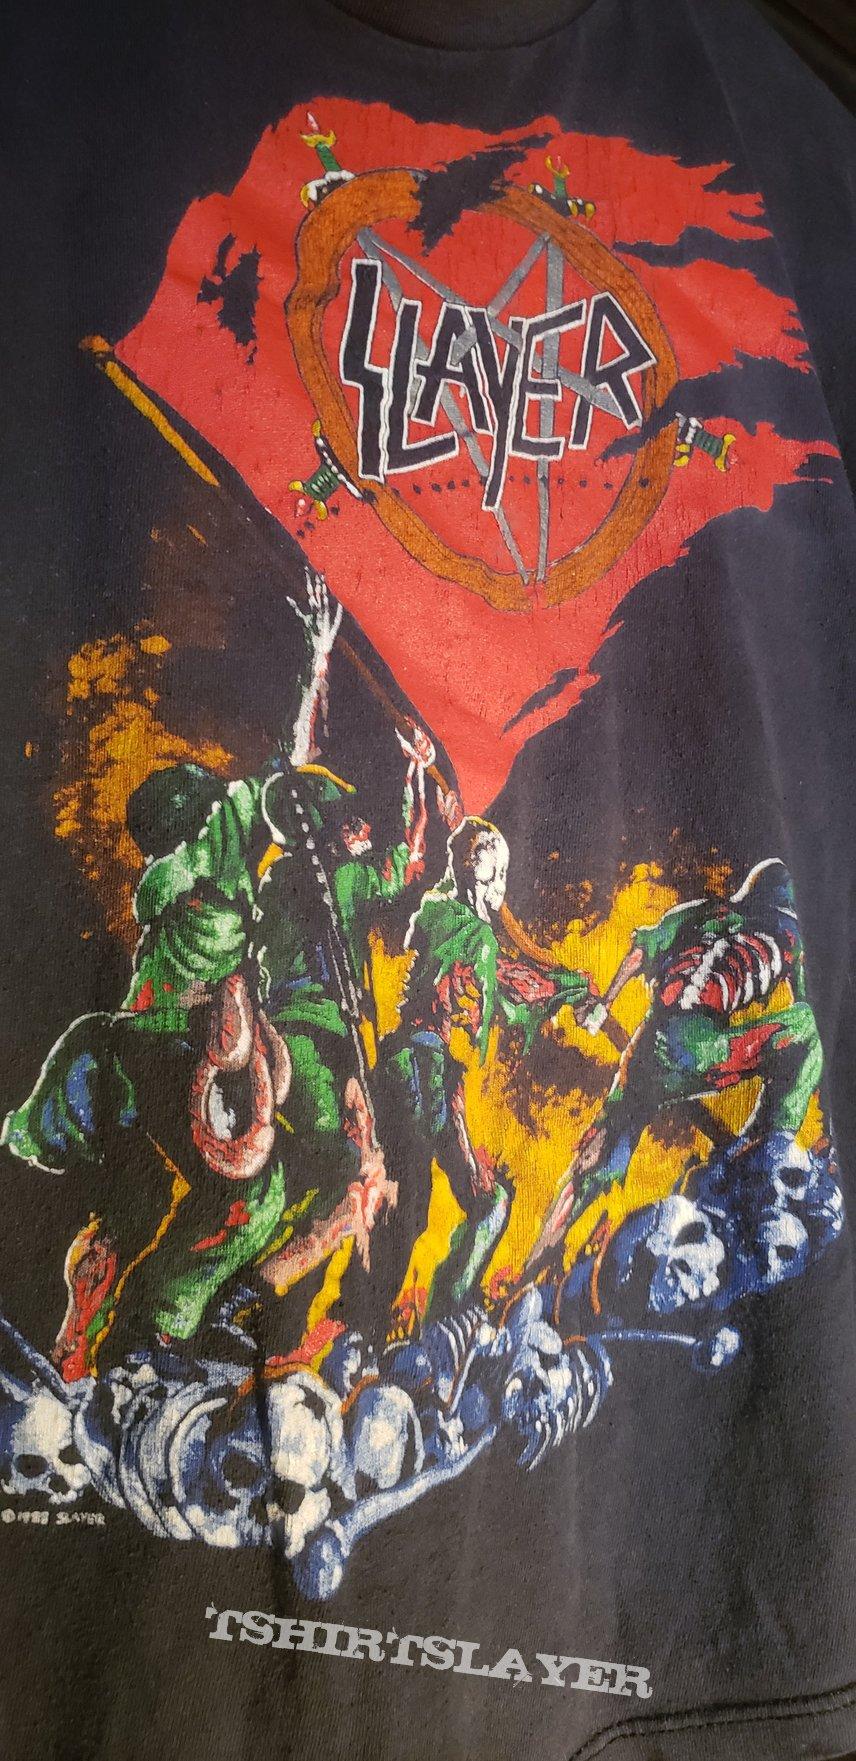 Slayer - World Sacrifice Tour